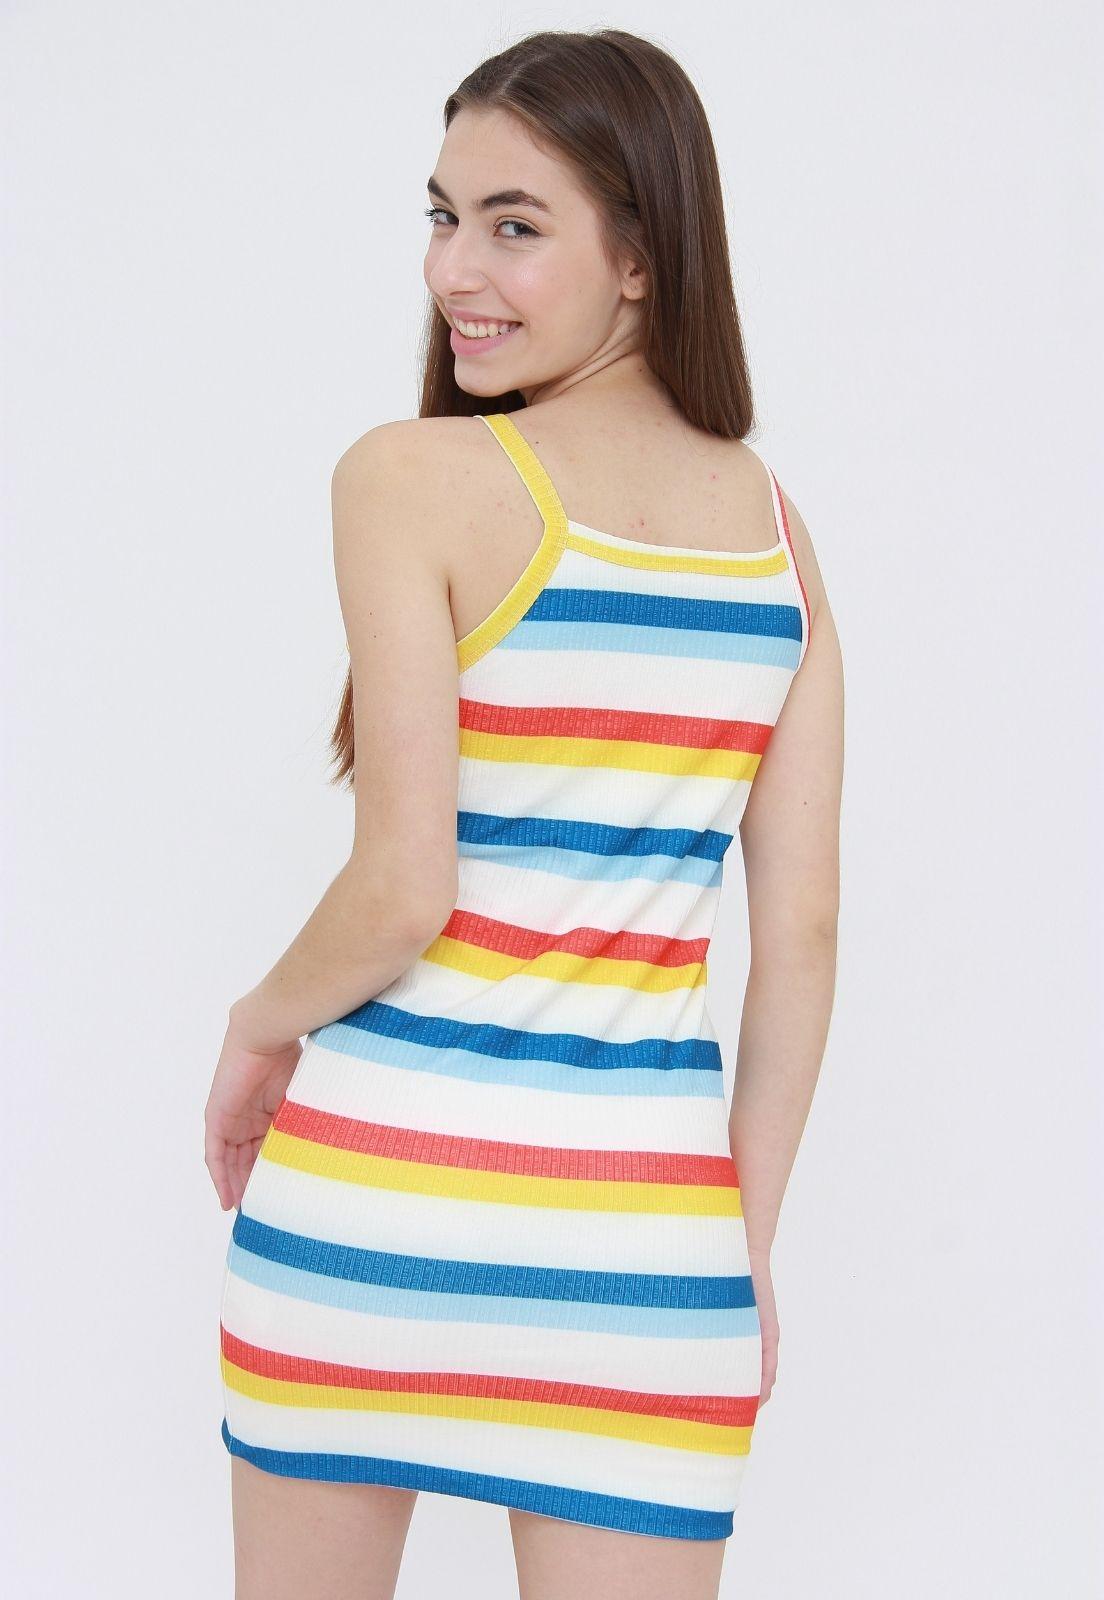 Vestido Ribbed  Colour Stripes  - Metro & Co.